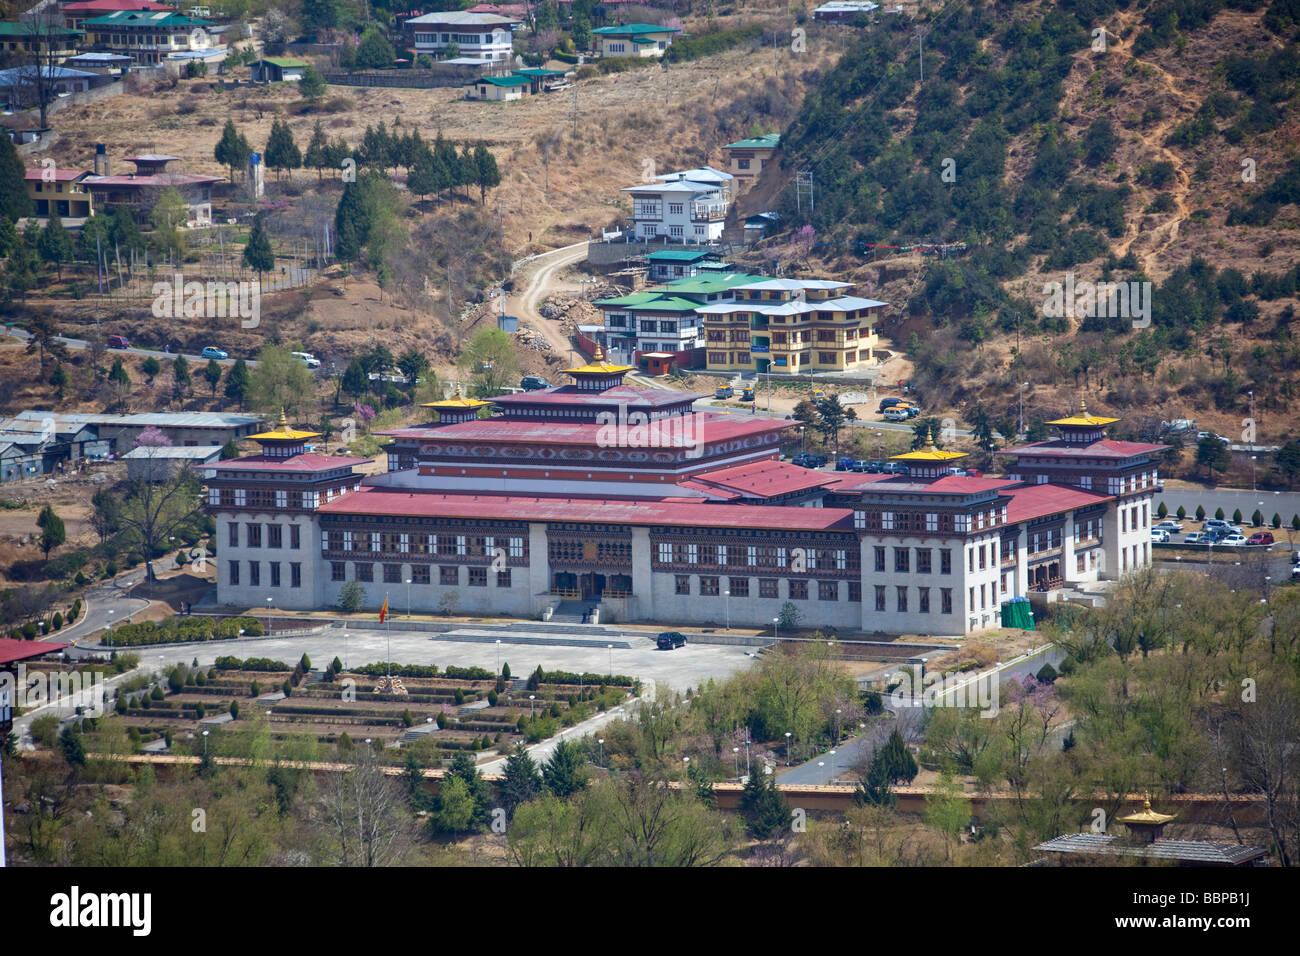 Palais Royal du Roi du Bhoutan Assemblée Générale Tashi Chho Dzong Thimphu bâtiments Photo Stock